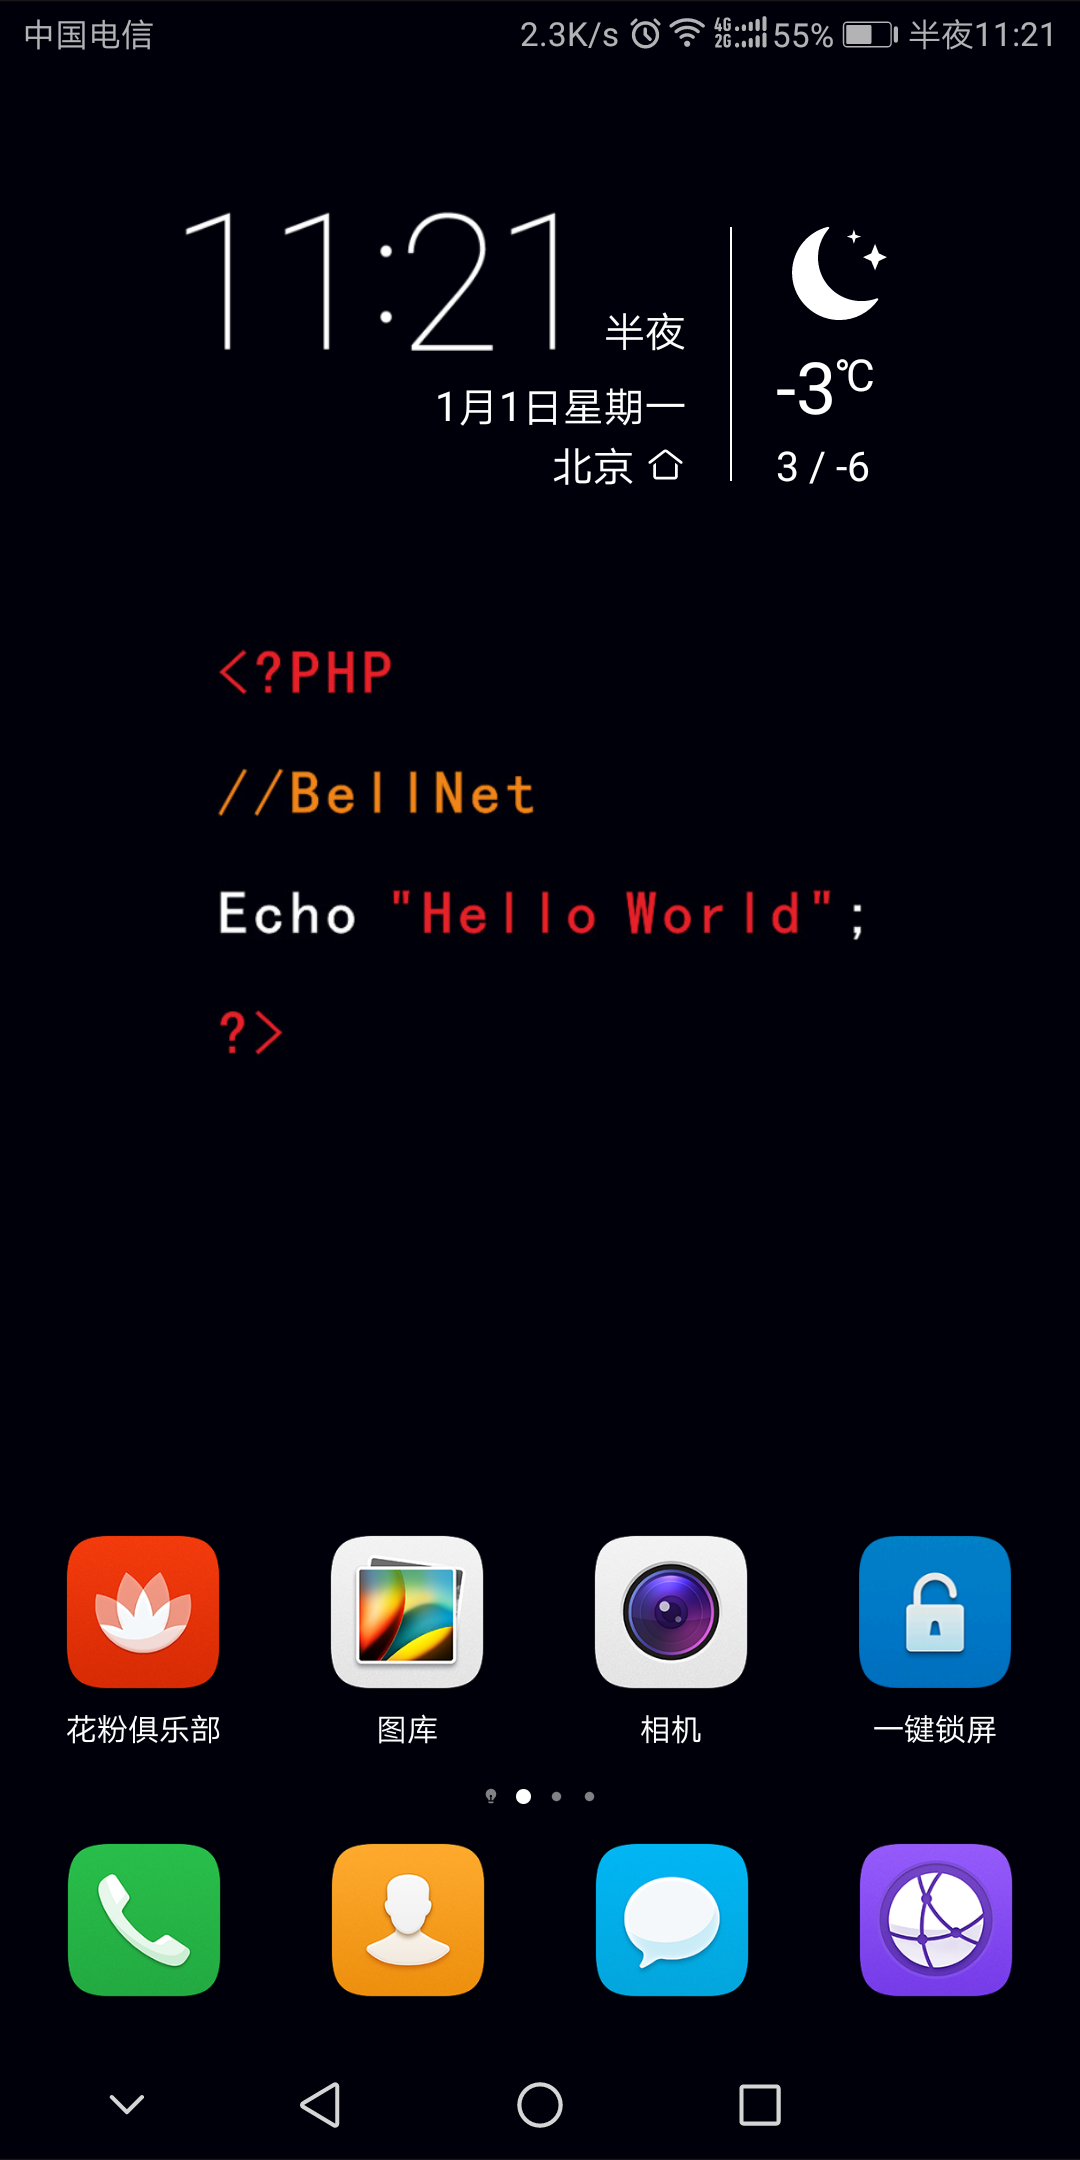 Screenshot_20180101-232104.png